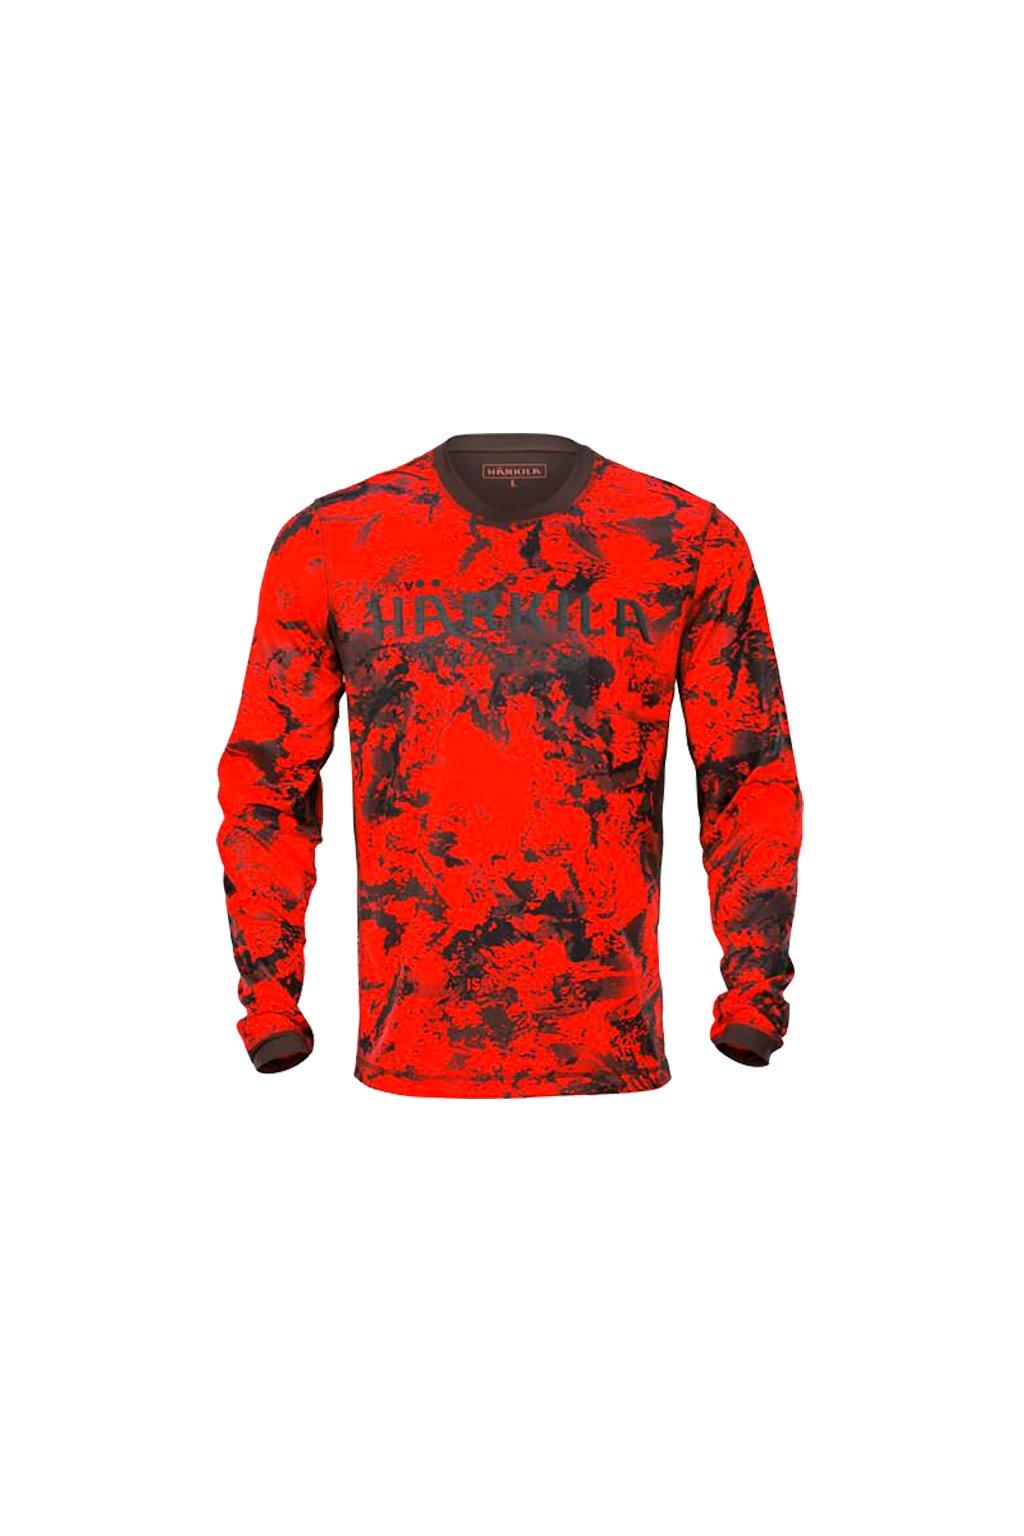 Härkila - Wildboar Pro triko pánské s dlouhým rukávem